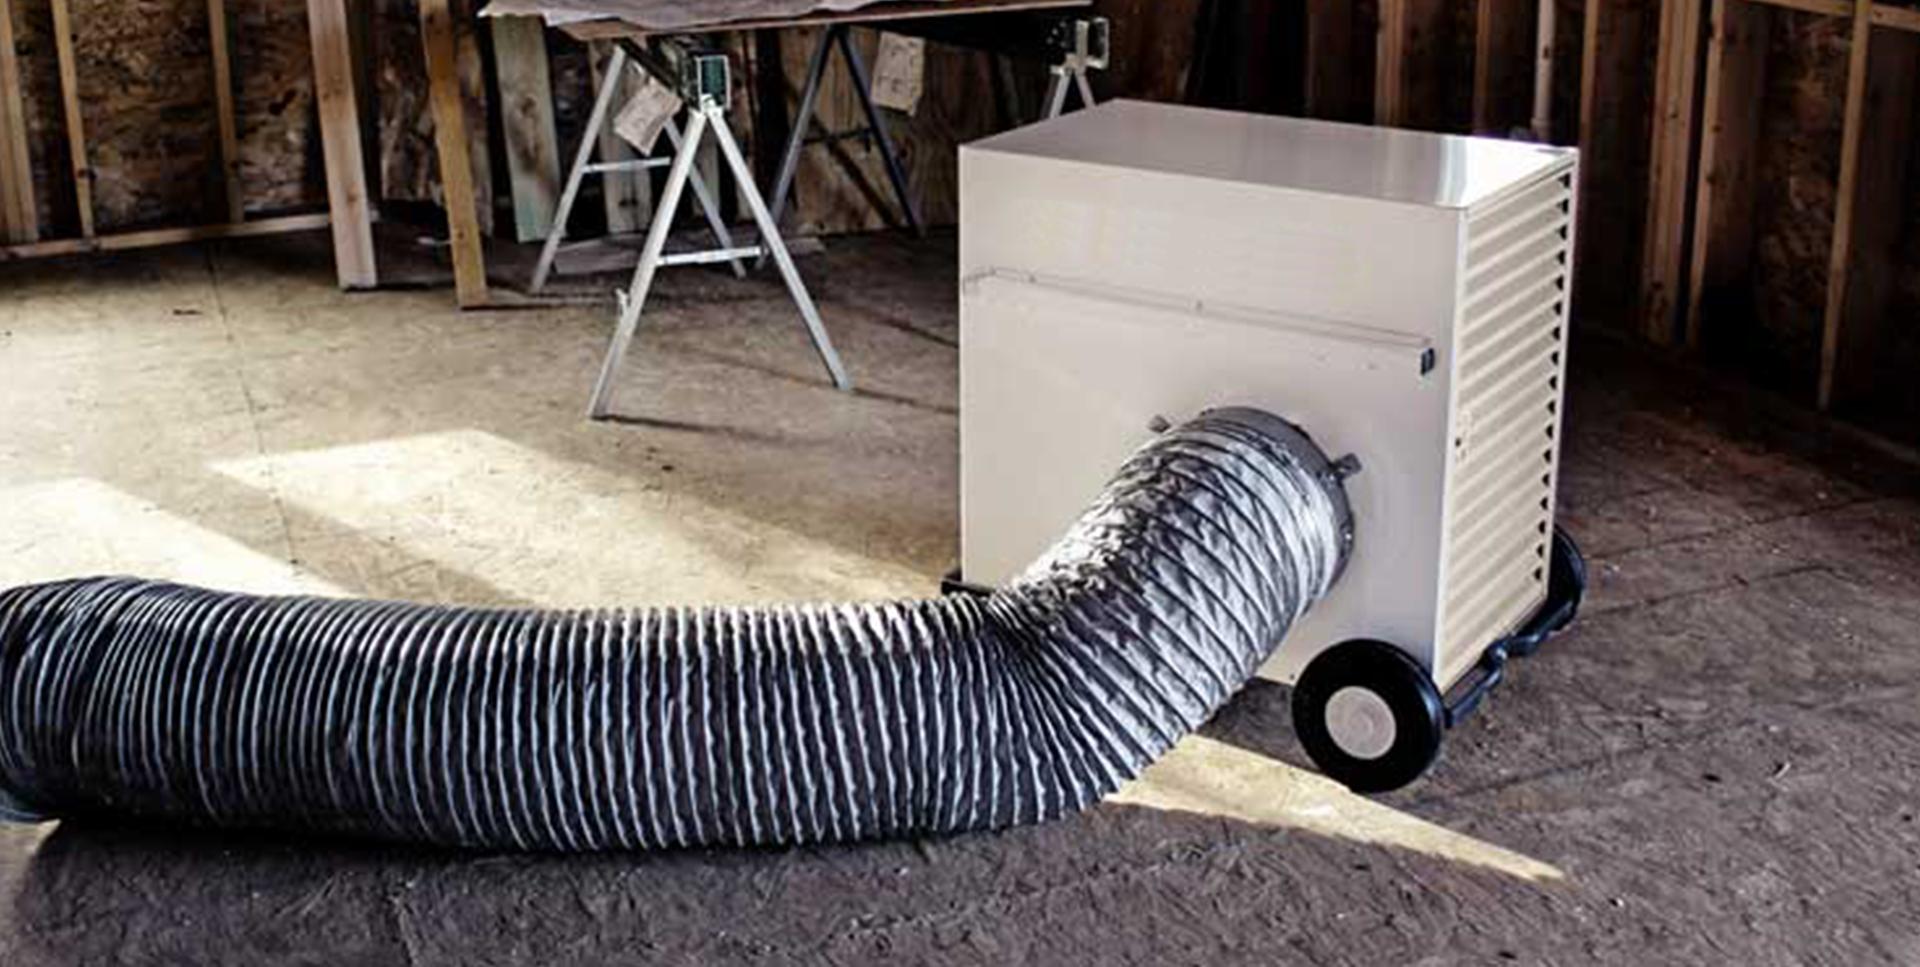 NHG Portable Space Heater Backup Heat